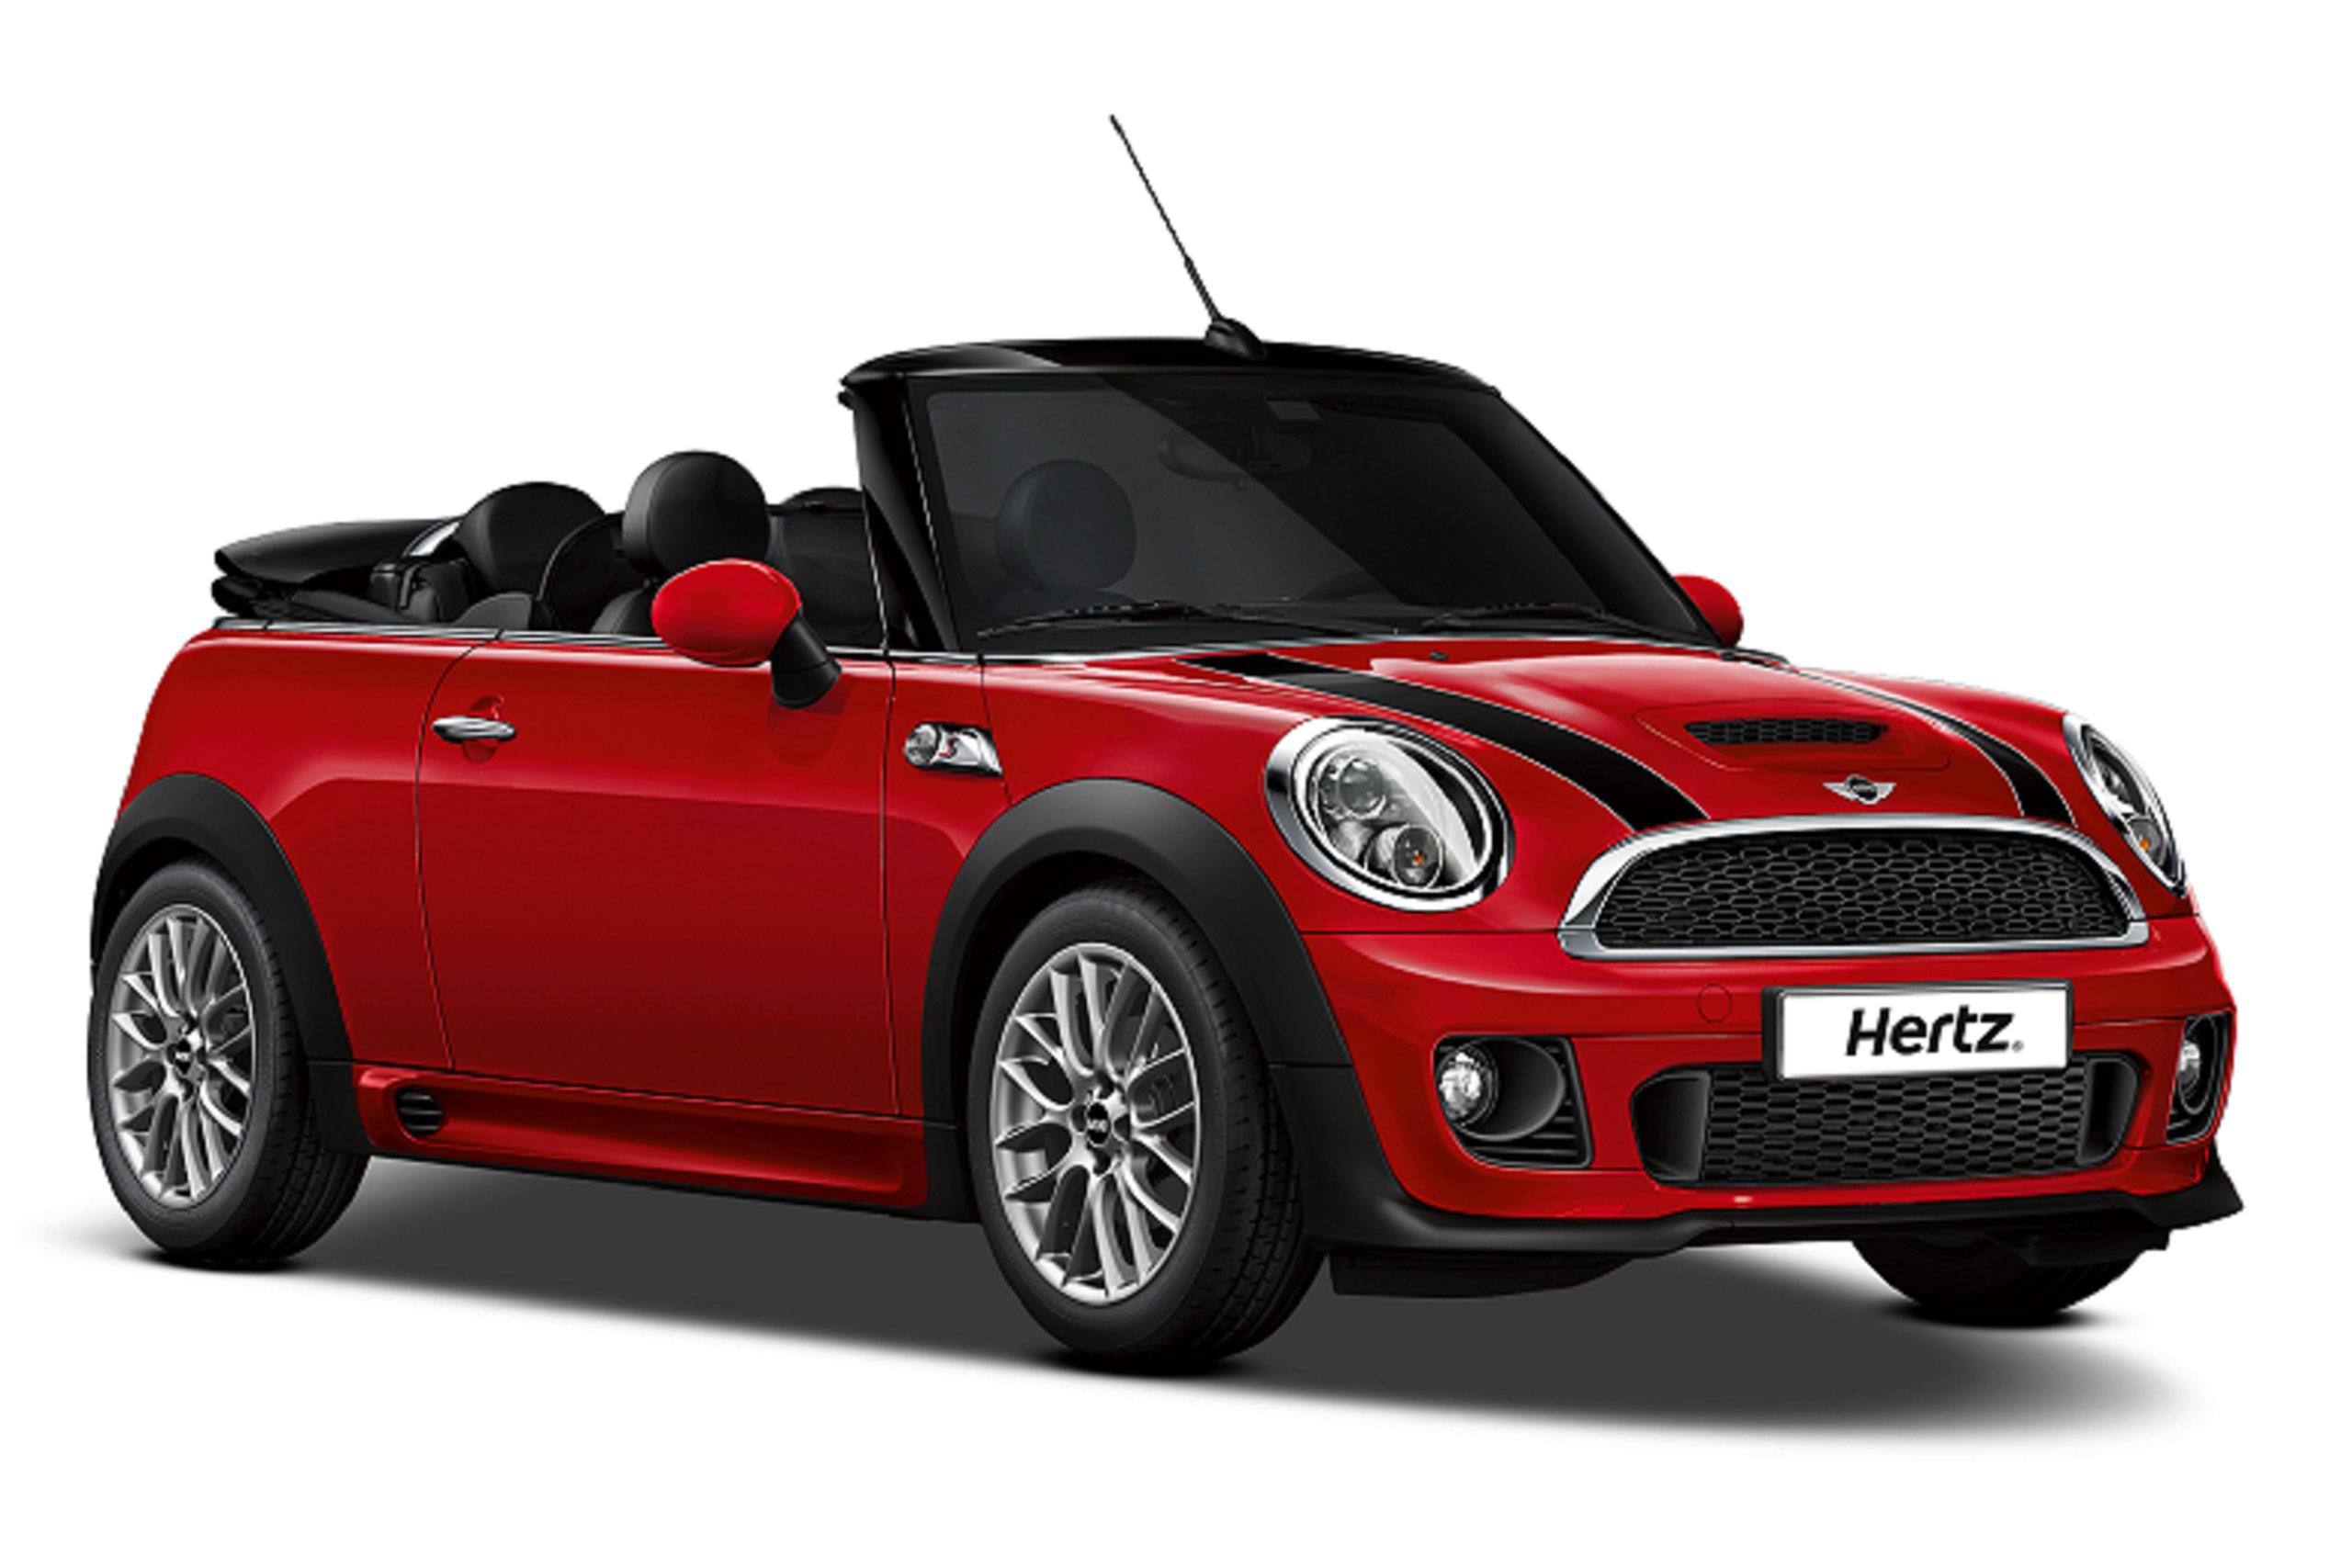 hertz-autovermietung-mini-coupe.jpg